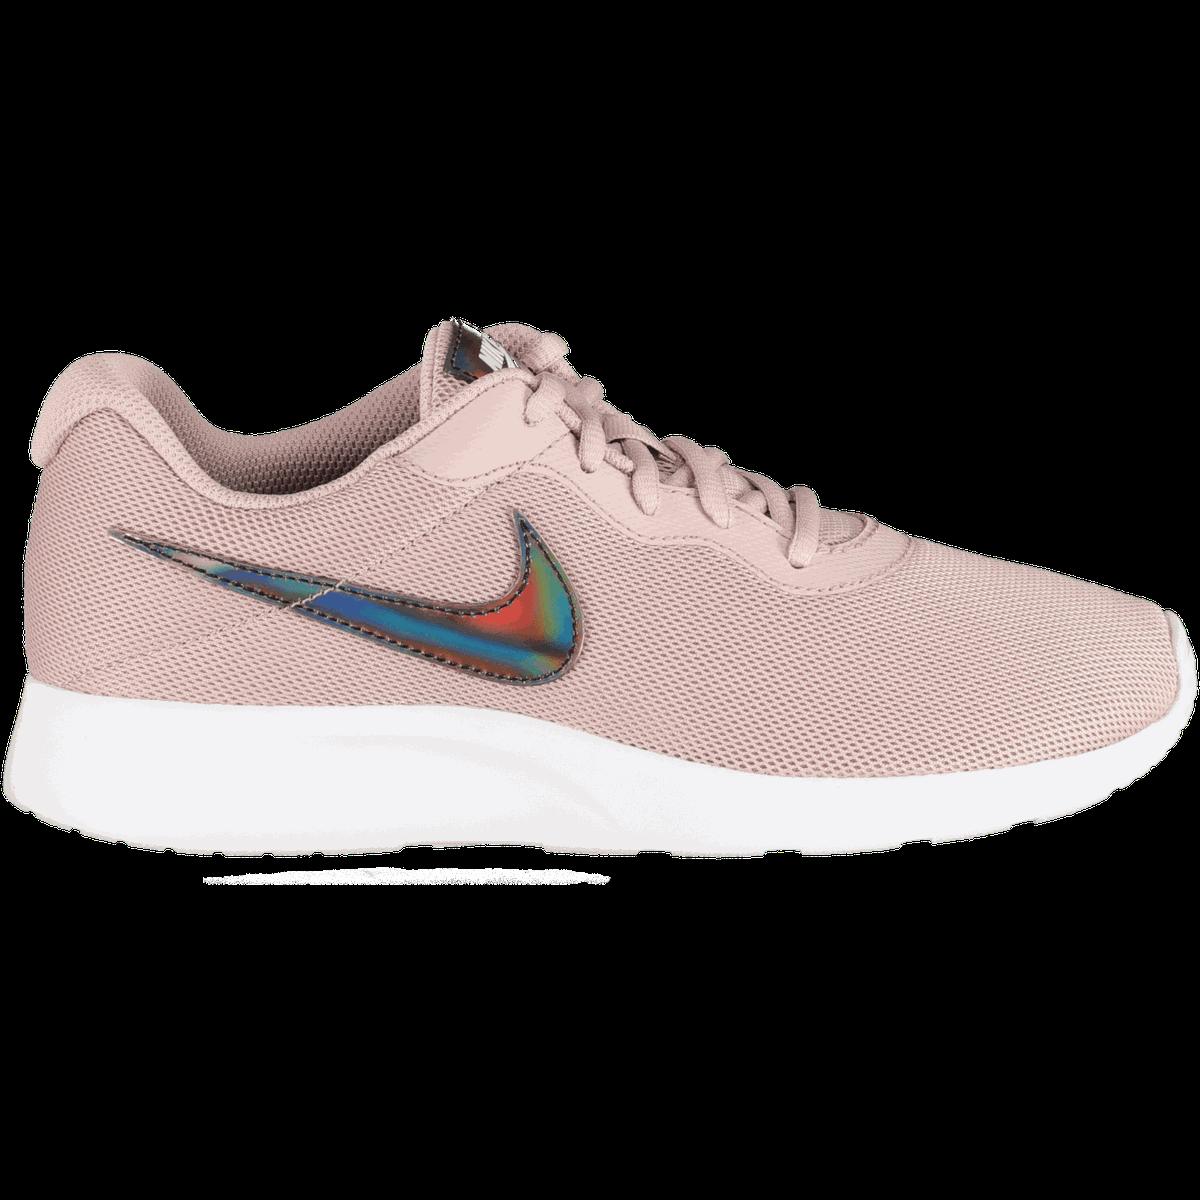 size 40 69be2 77b61 Nike Tanjun, naisten vapaa-ajan kengät - Punainen - Naisten vapaa-ajan  kengät